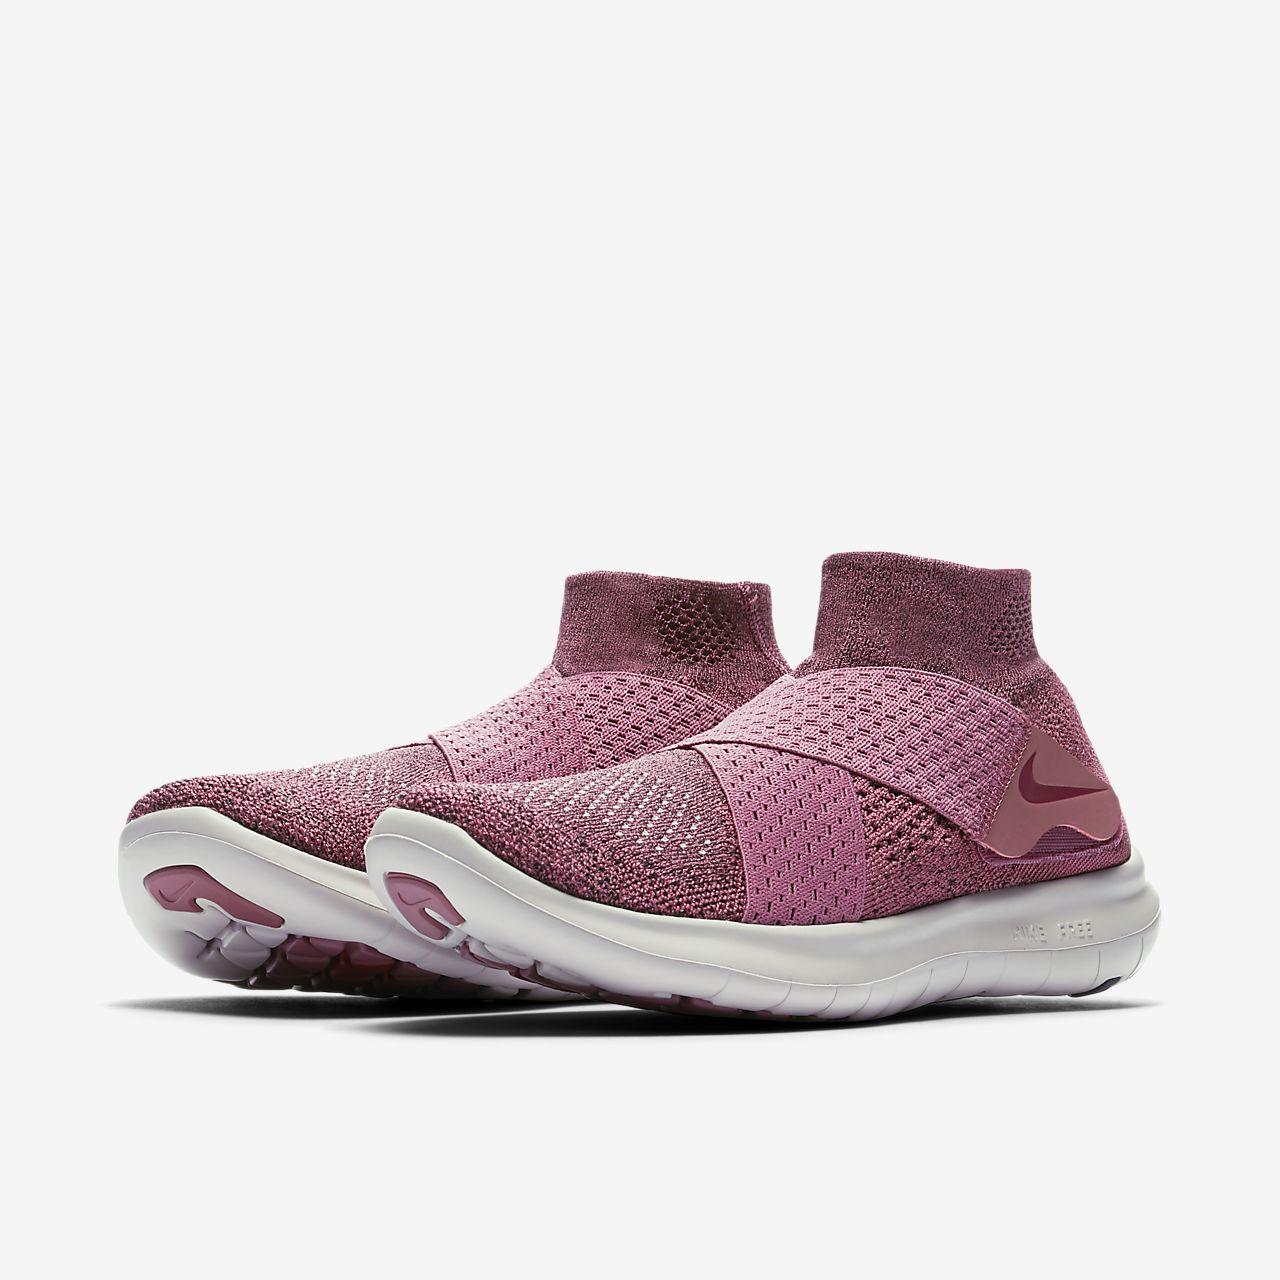 official photos ebcf3 2971a Scarpa da running Nike Free RN Motion Flyknit 2017 - Donna. Nike.com CH